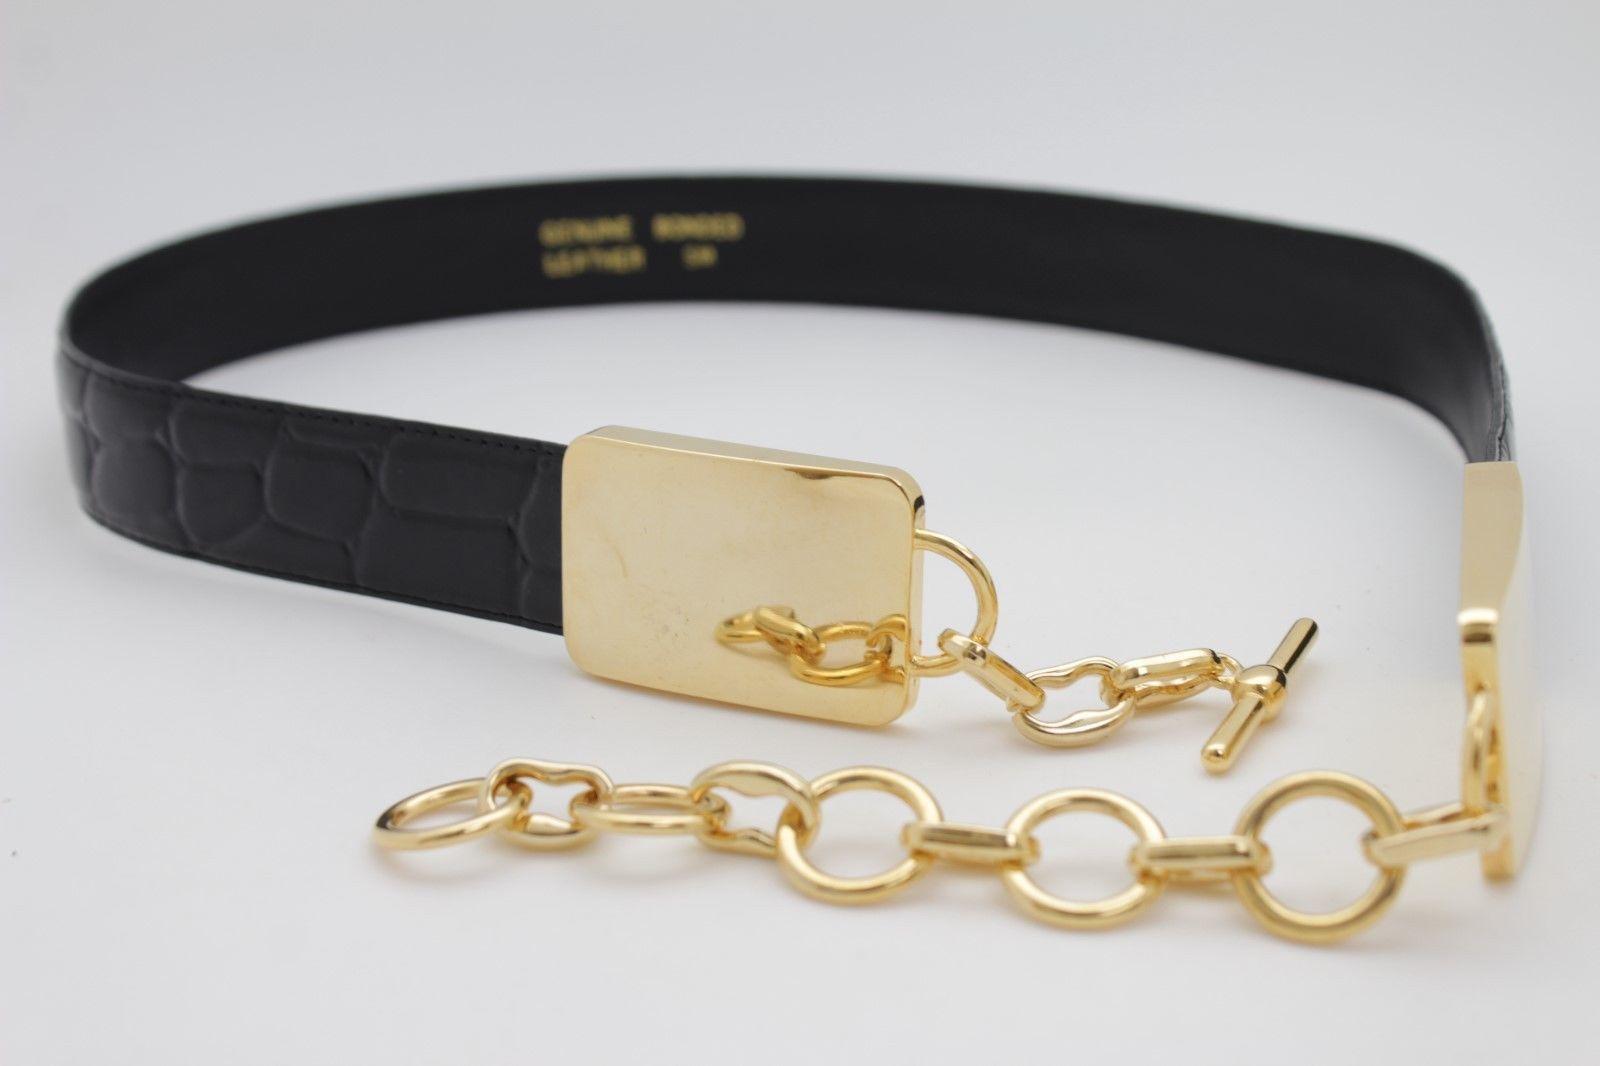 Women Wide Faux Leather Silver Color Belt Gold Metal Buckle Elegant Western S M